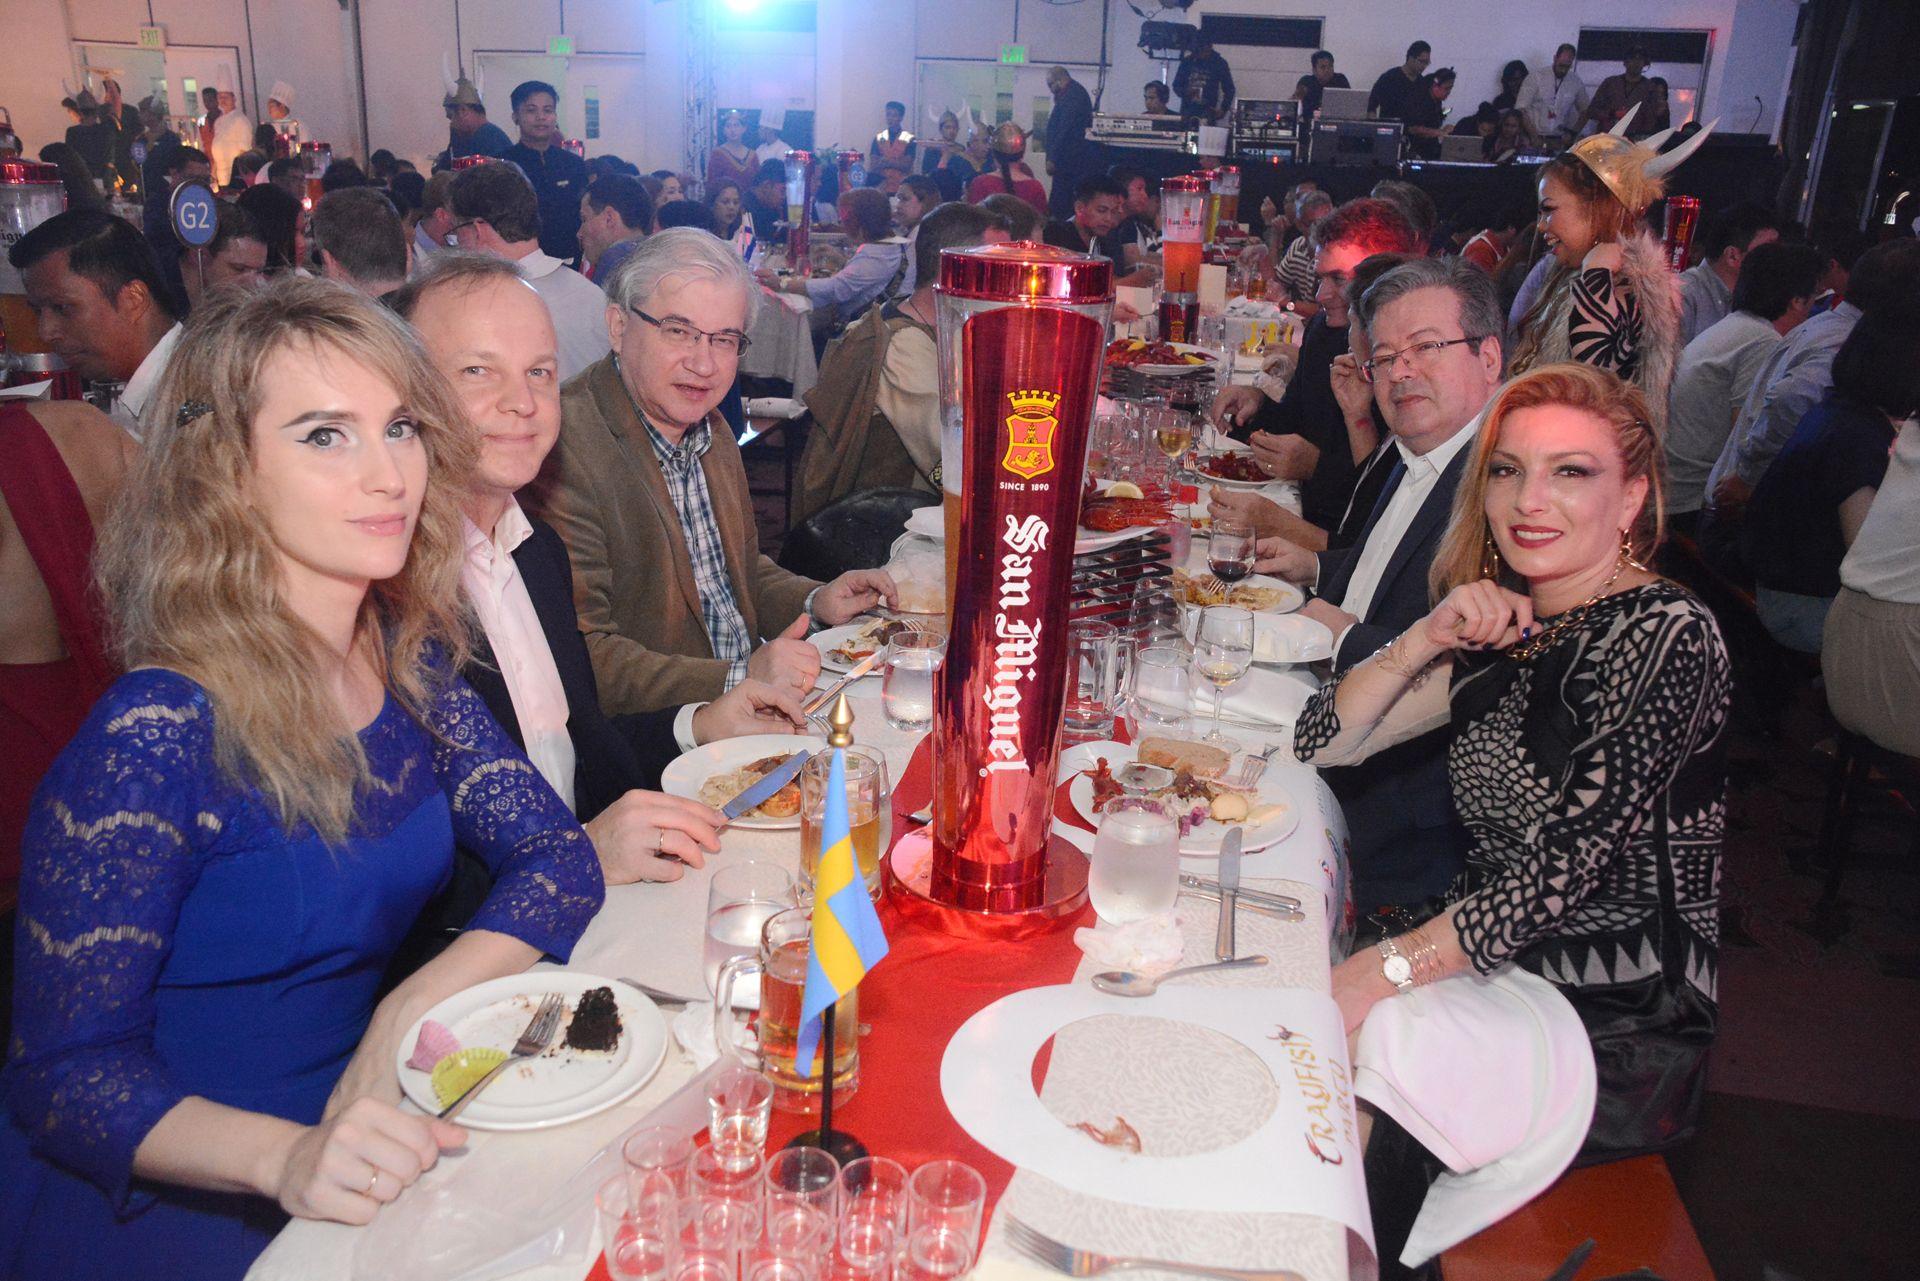 Anna Abrashina, Russian Embassy's Denis Abrashina, Russian Ambassador Igor Khovaev, French Ambassador Nicolas Galey and Sofitel Philippine Plaza's Director of Sales and Marketing Assia Daourova